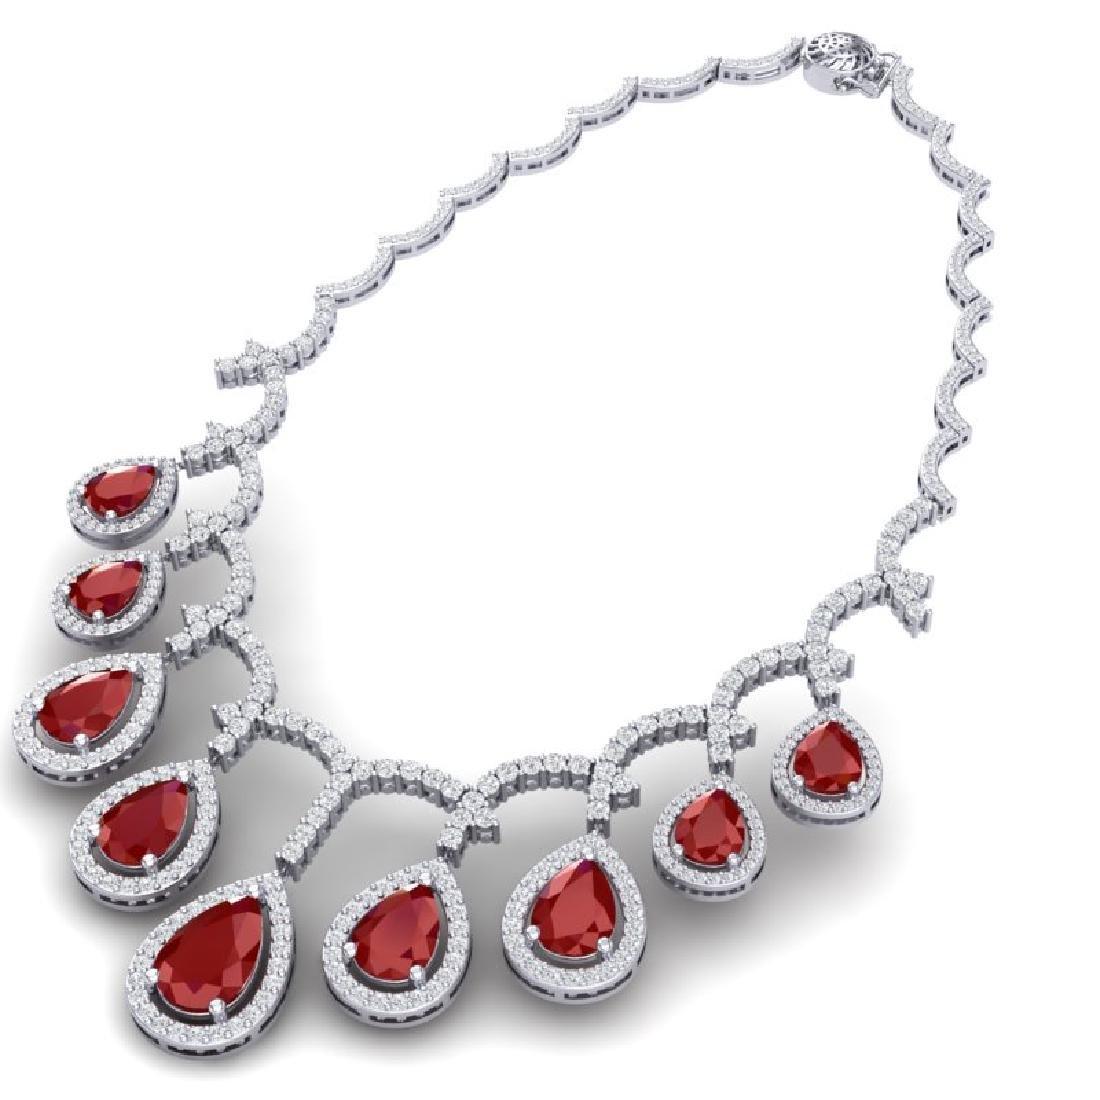 31.5 CTW Royalty Designer Ruby & VS Diamond Necklace - 2